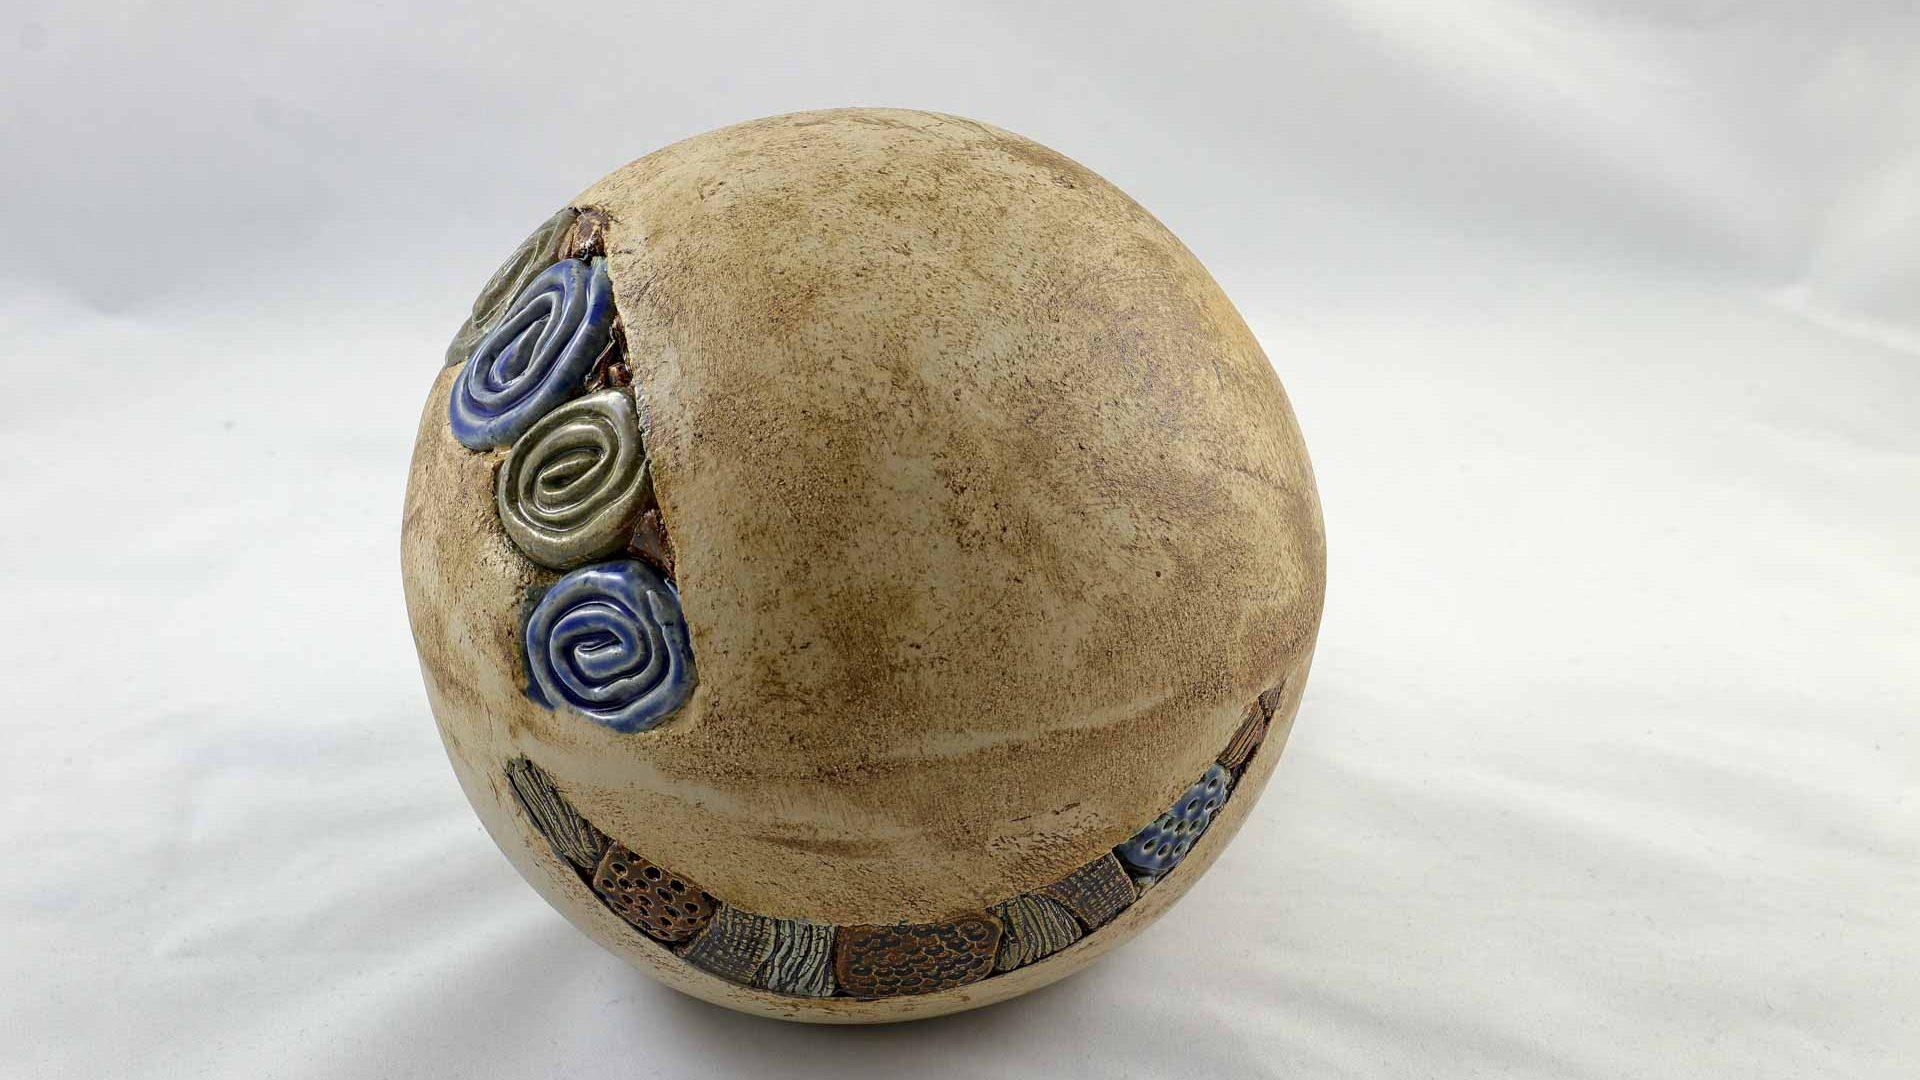 Petra Zobl Keramik - Hochbrand Kugel magma braun beige saphirblau manganspinell 2